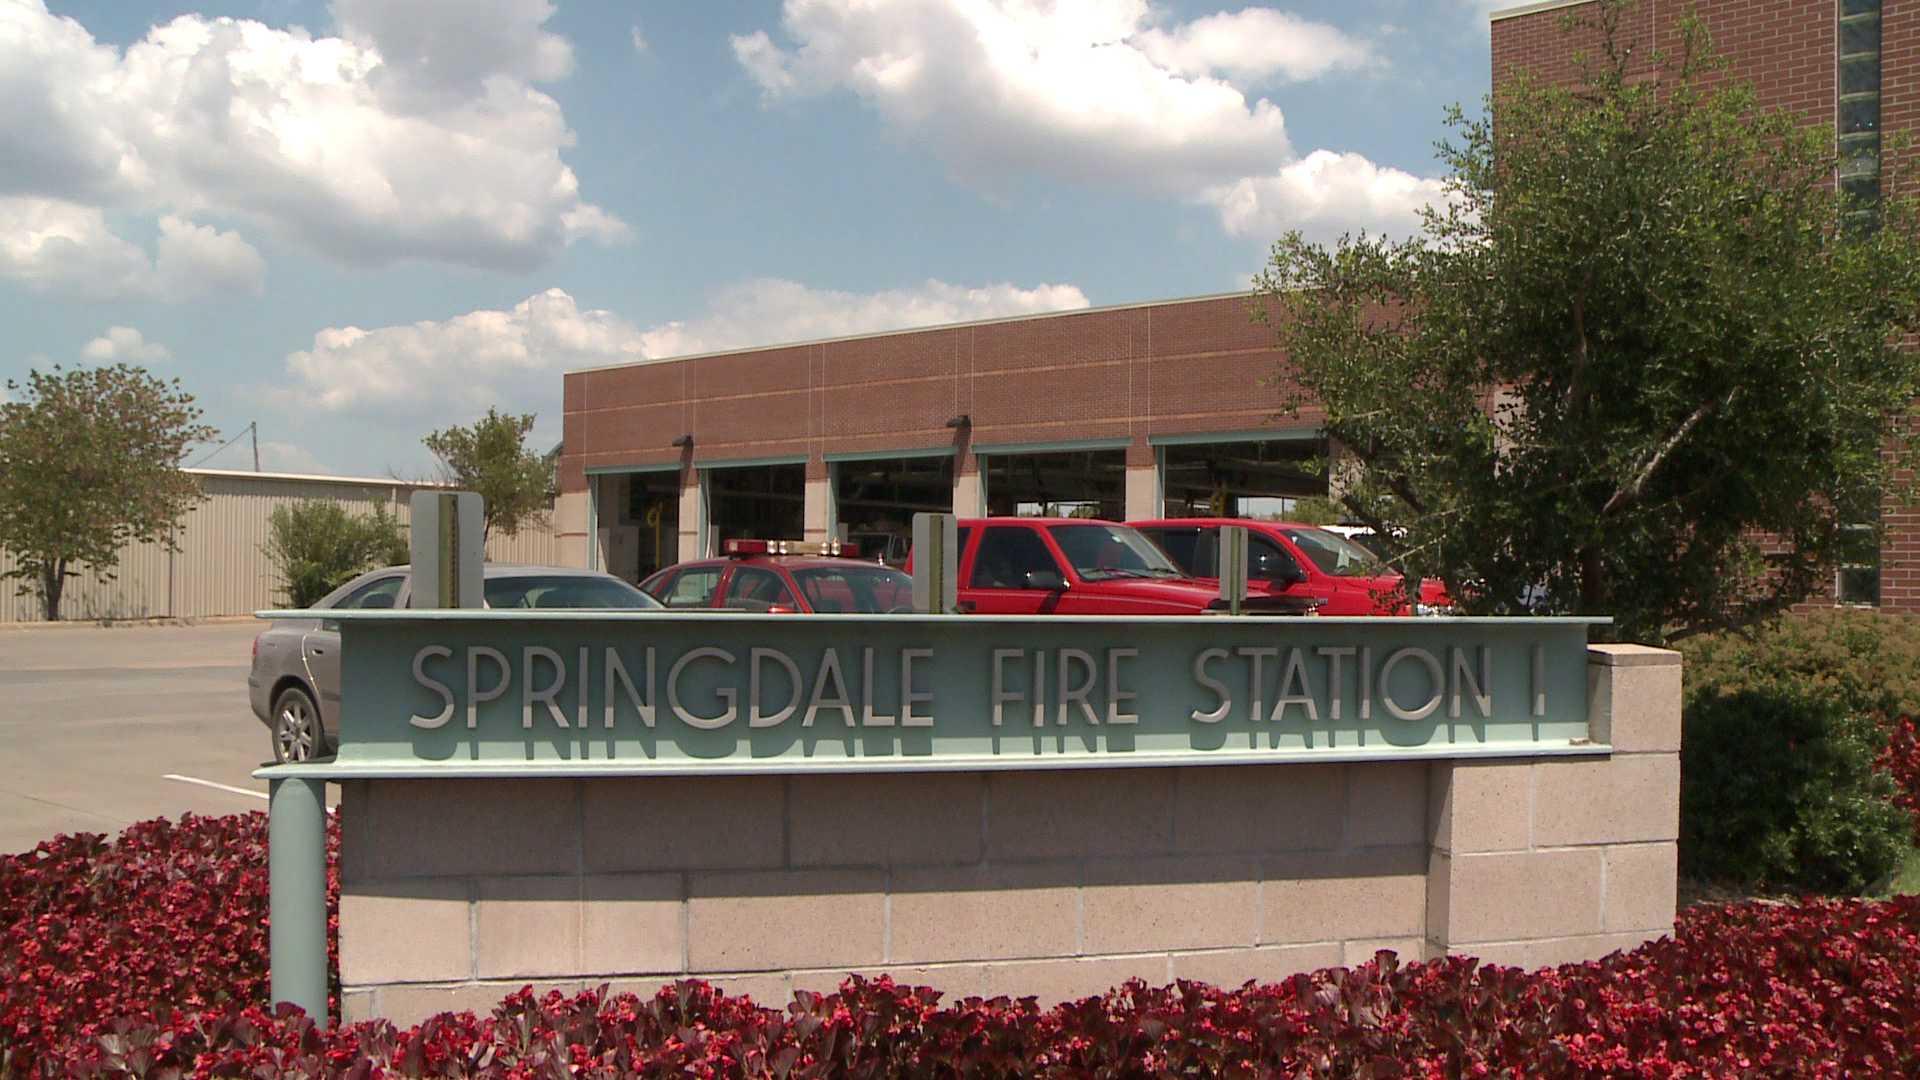 SpringdaleFire